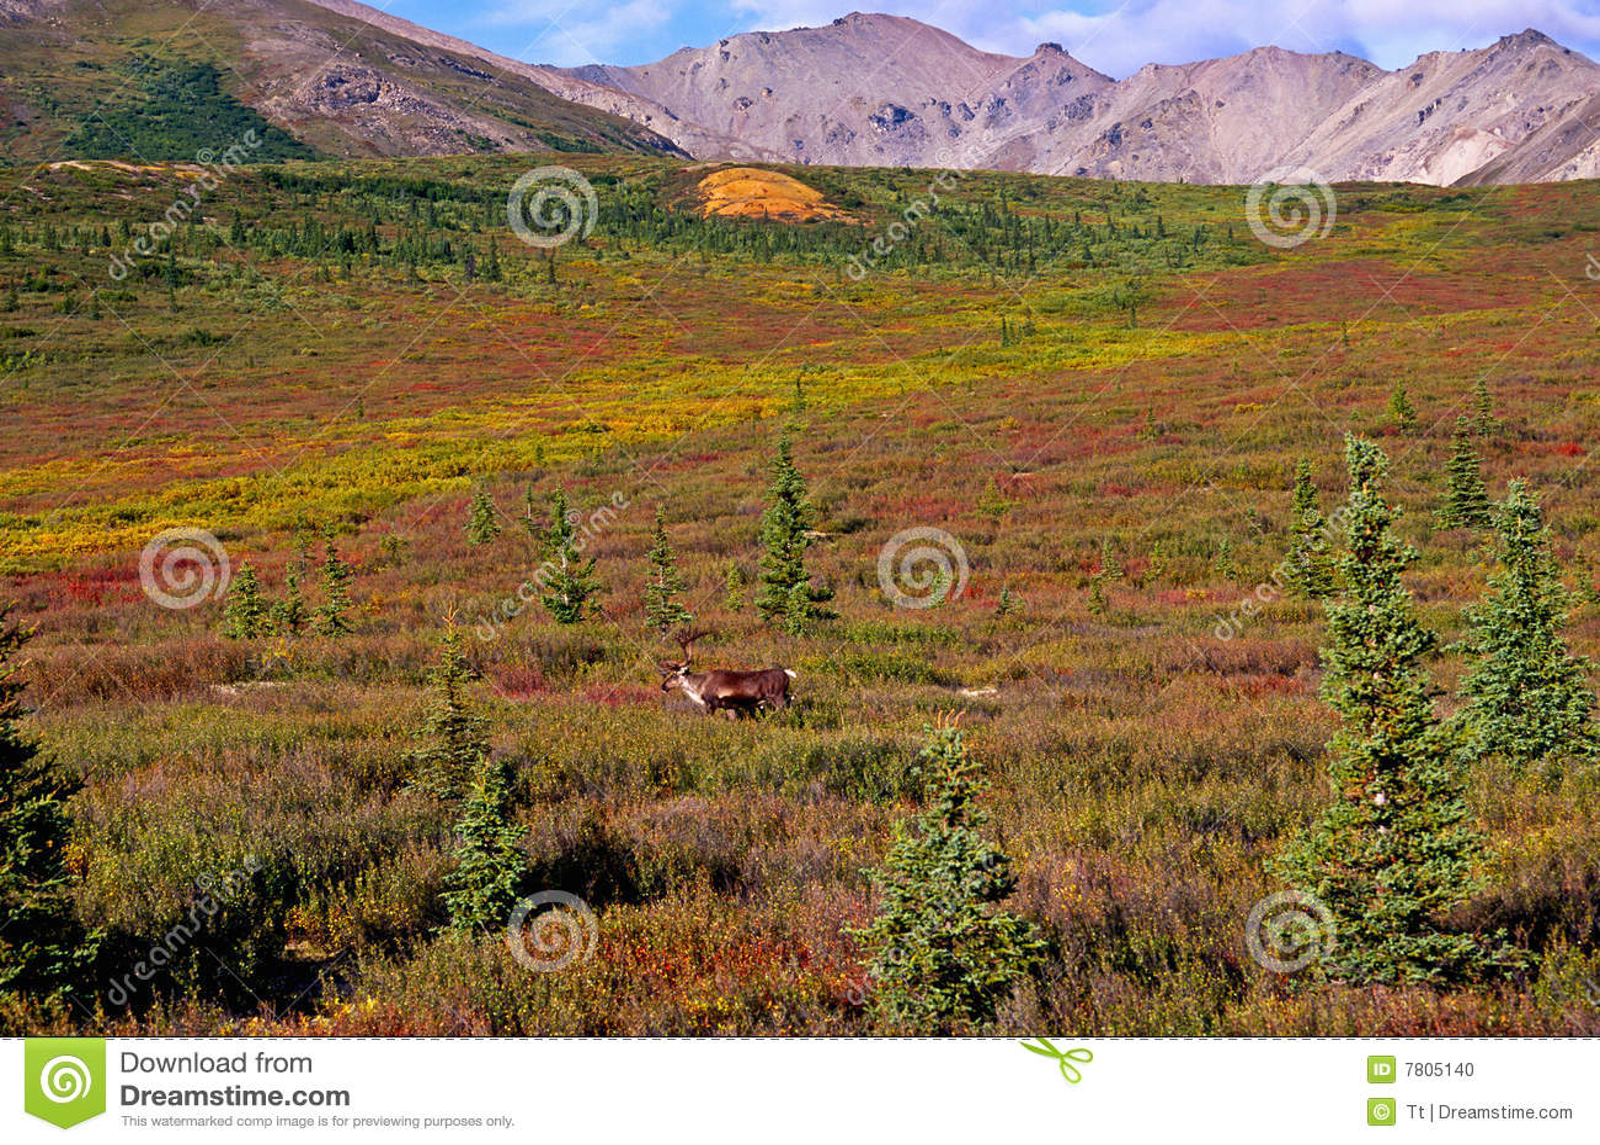 Caribou tundra